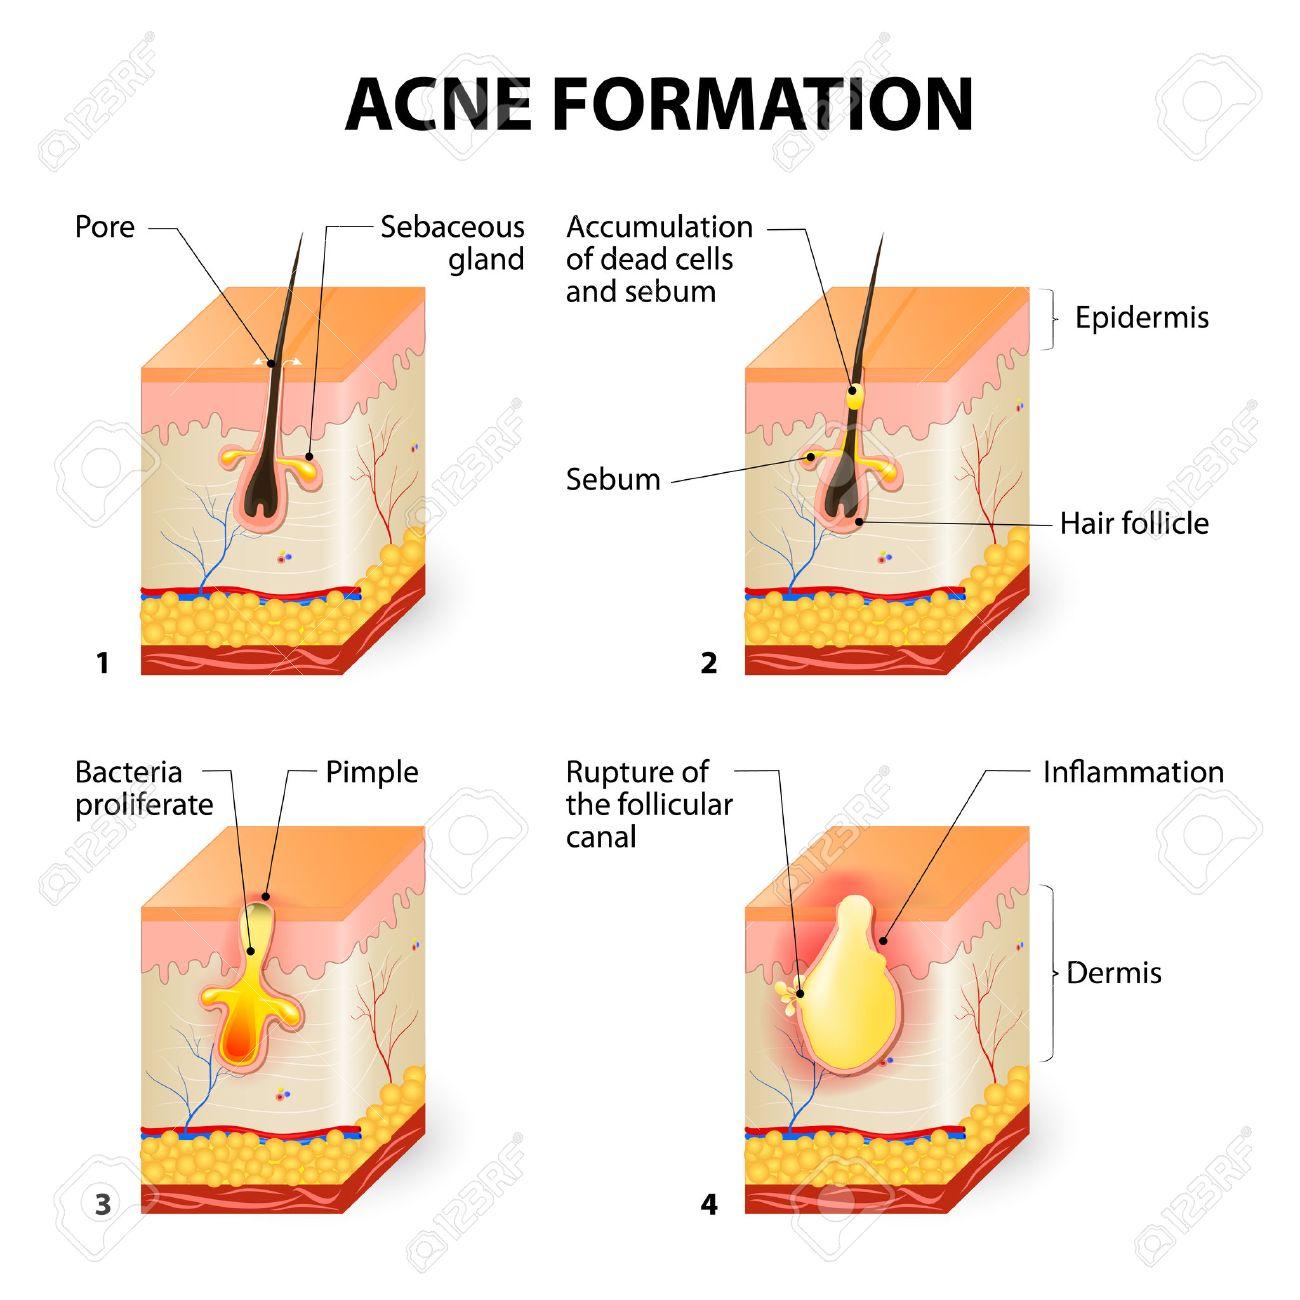 http://n3.datasn.io/data/api/v1/n3zm/image_of_skin_disease_5/main/skin_disease_image_download//f5/46/e9/46/f546e946ded293dcd535f9d26ea8386943cbb8aa.jpg